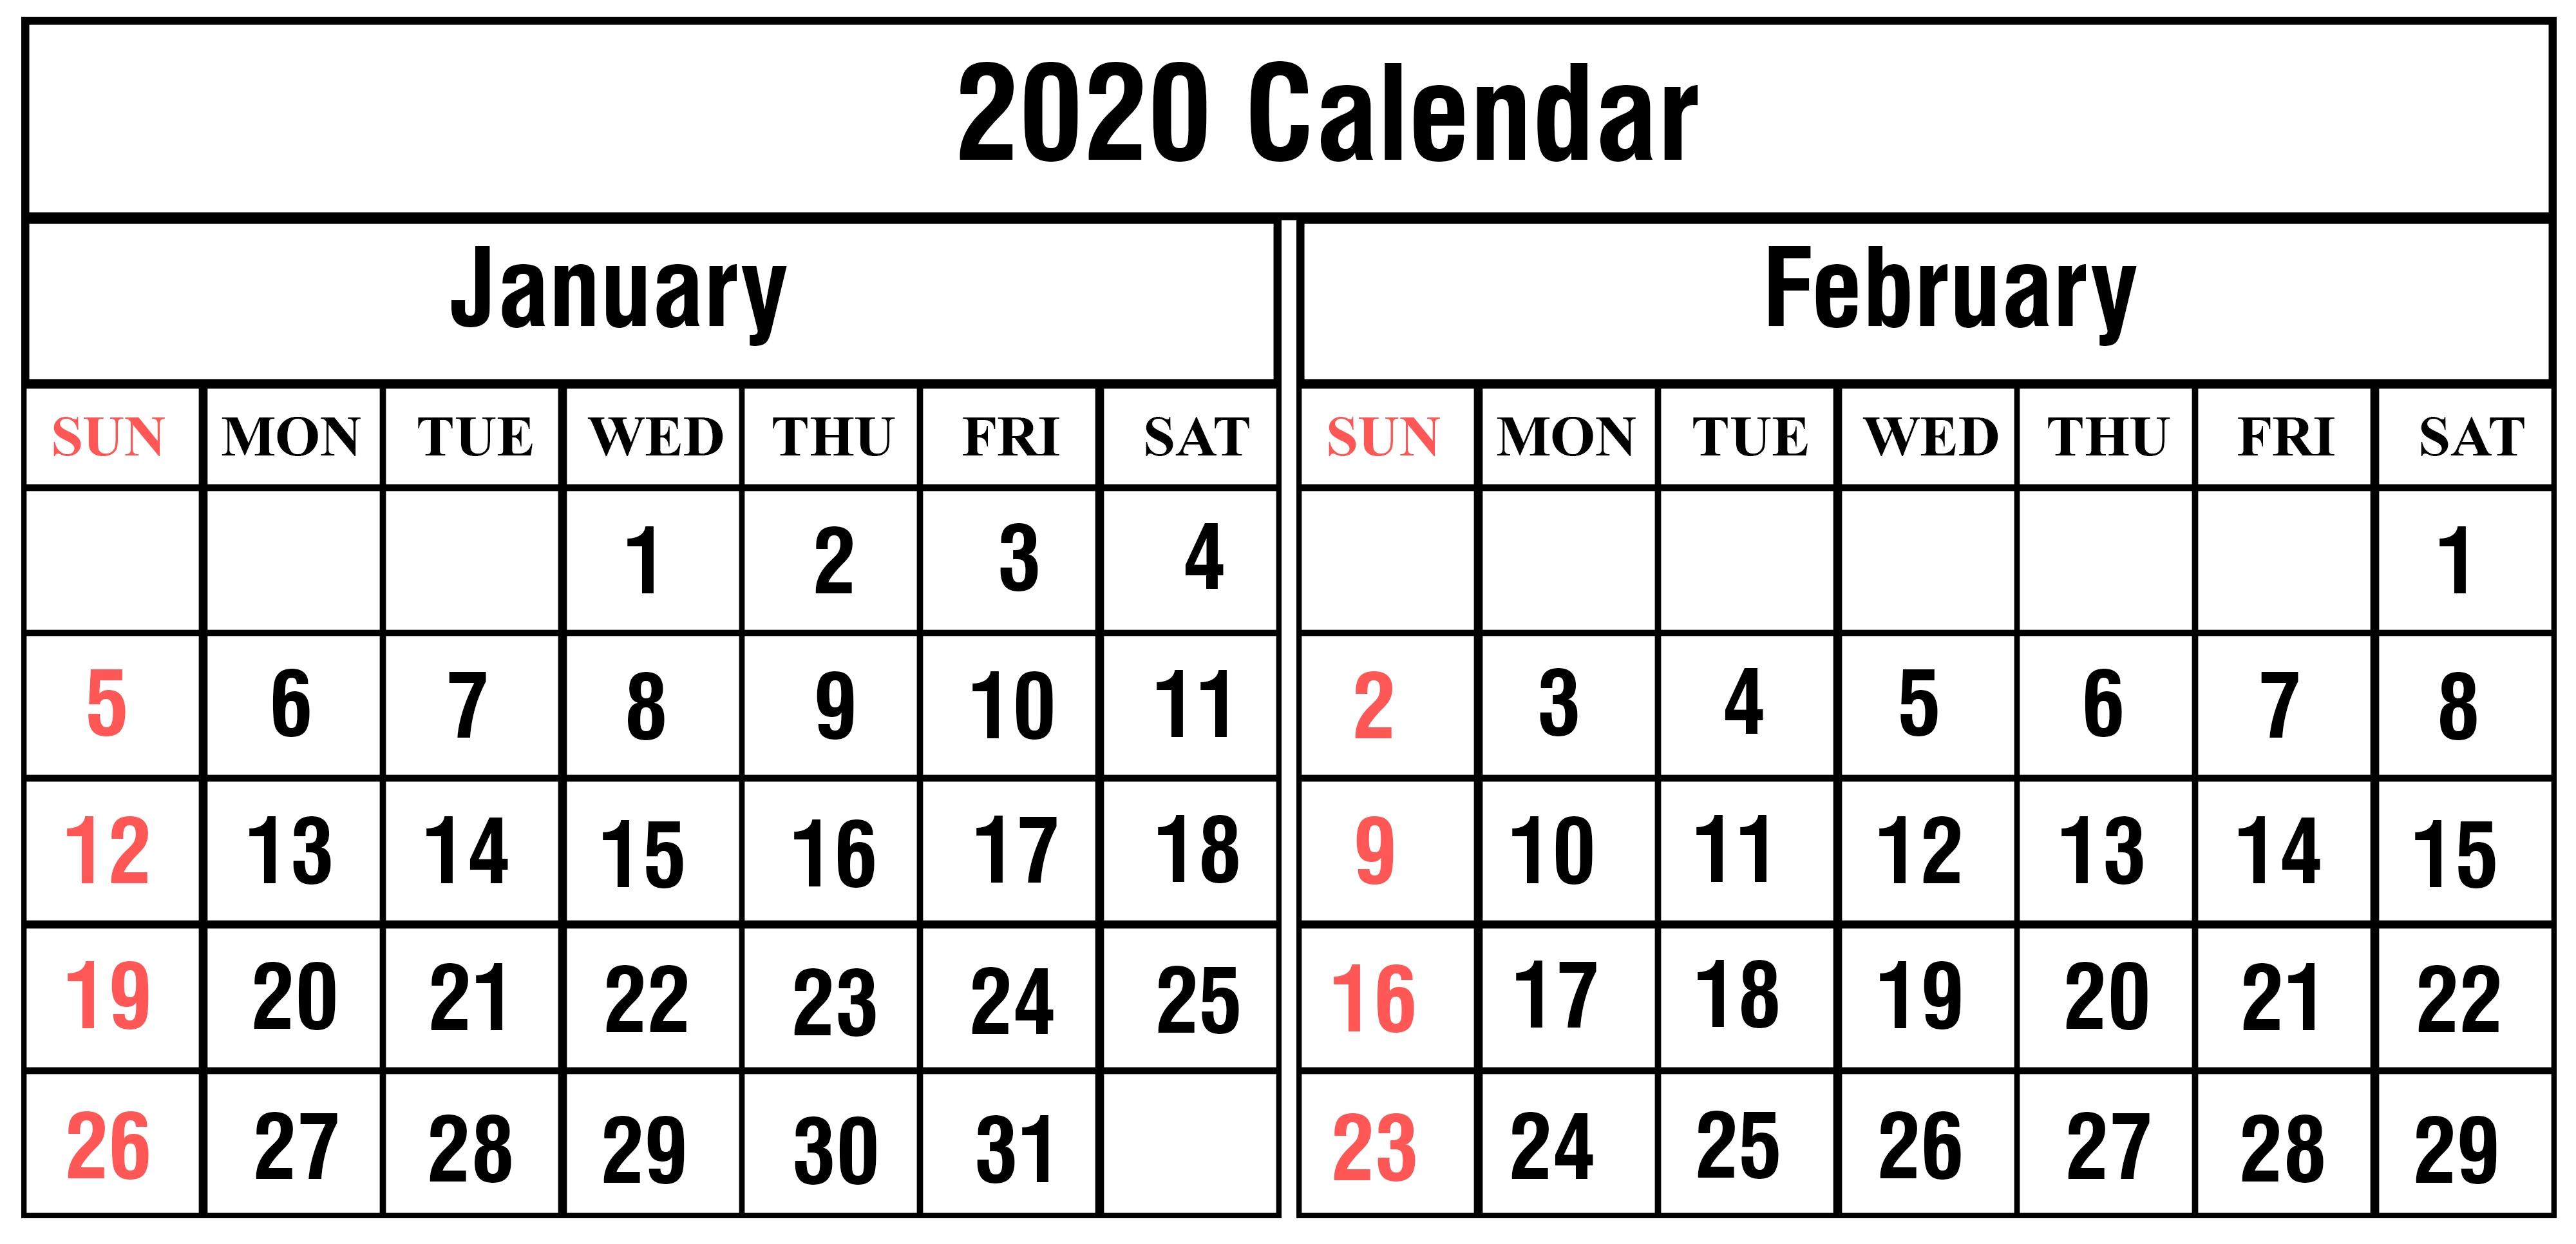 January February 2020 Calendar Printable Template Pdf Word-January And February 2020 Calendar